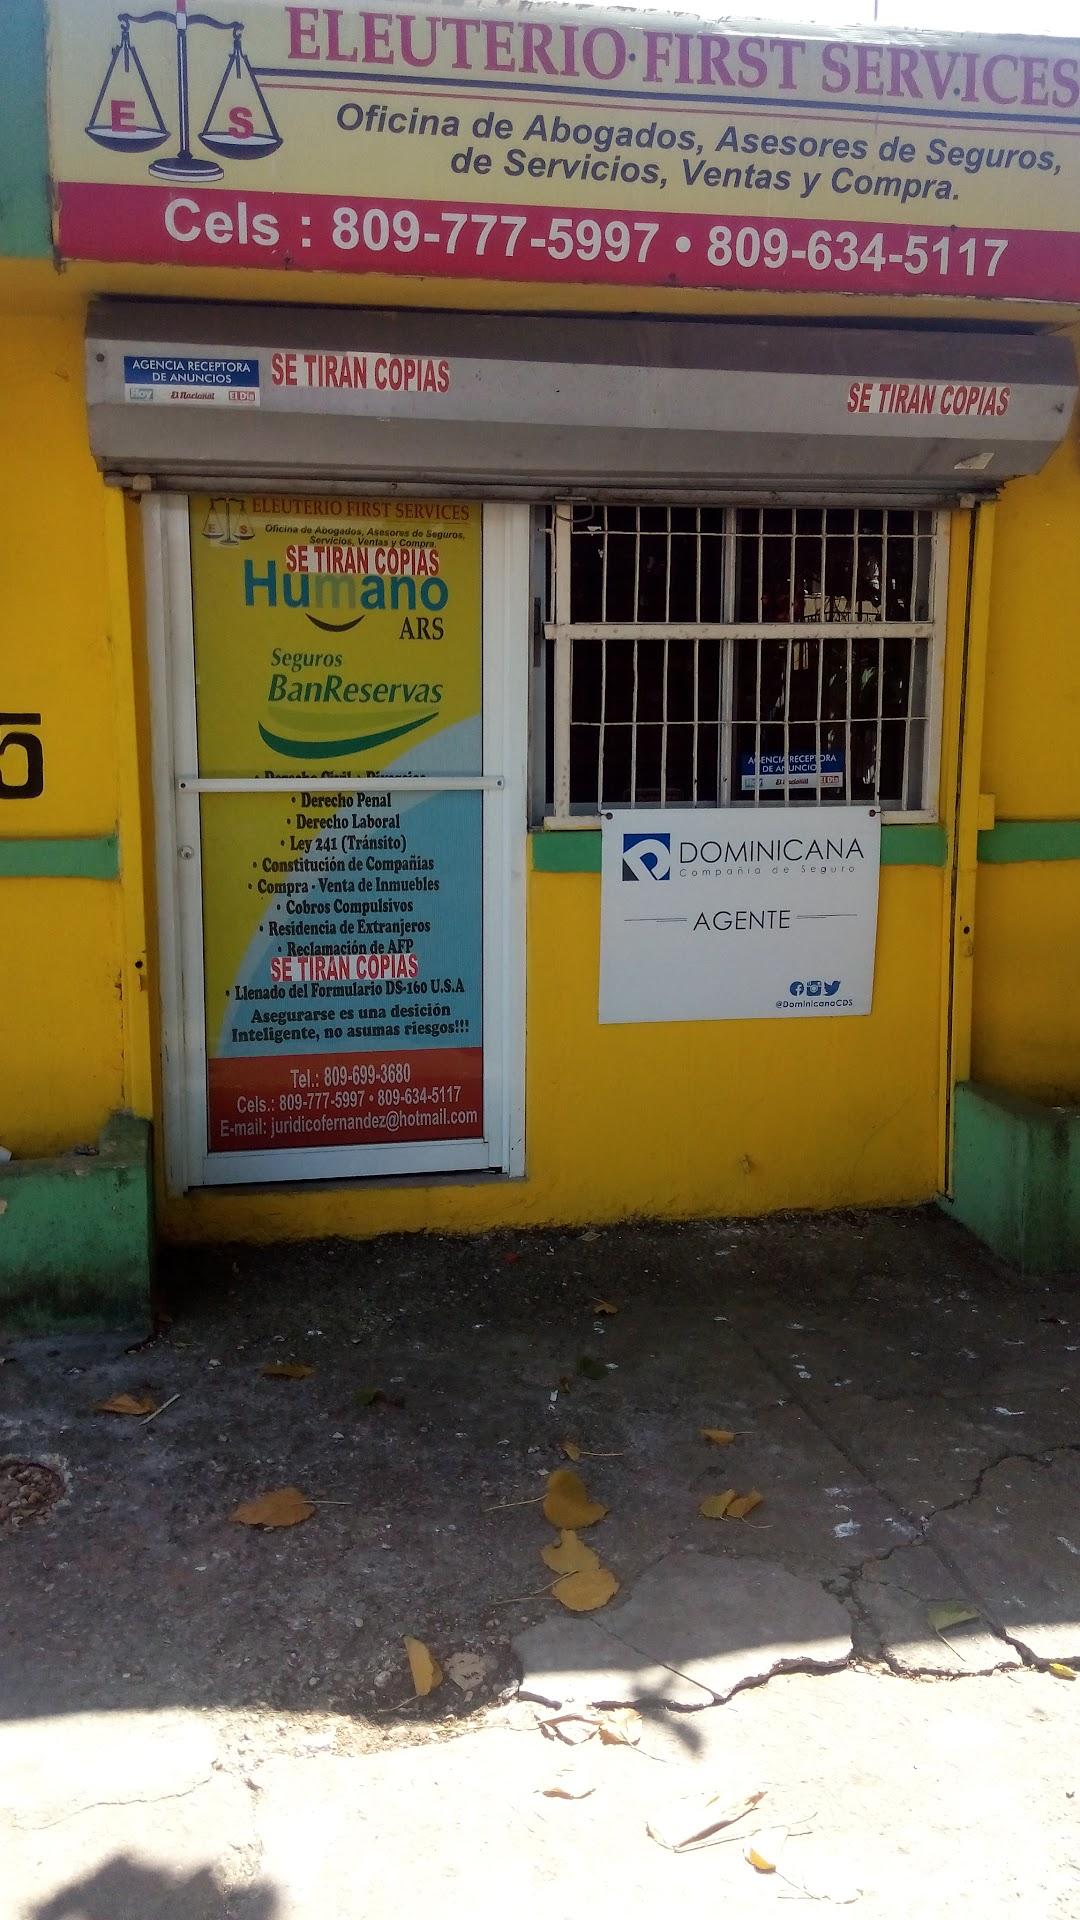 ELEUTERIO FIRST SERVICES